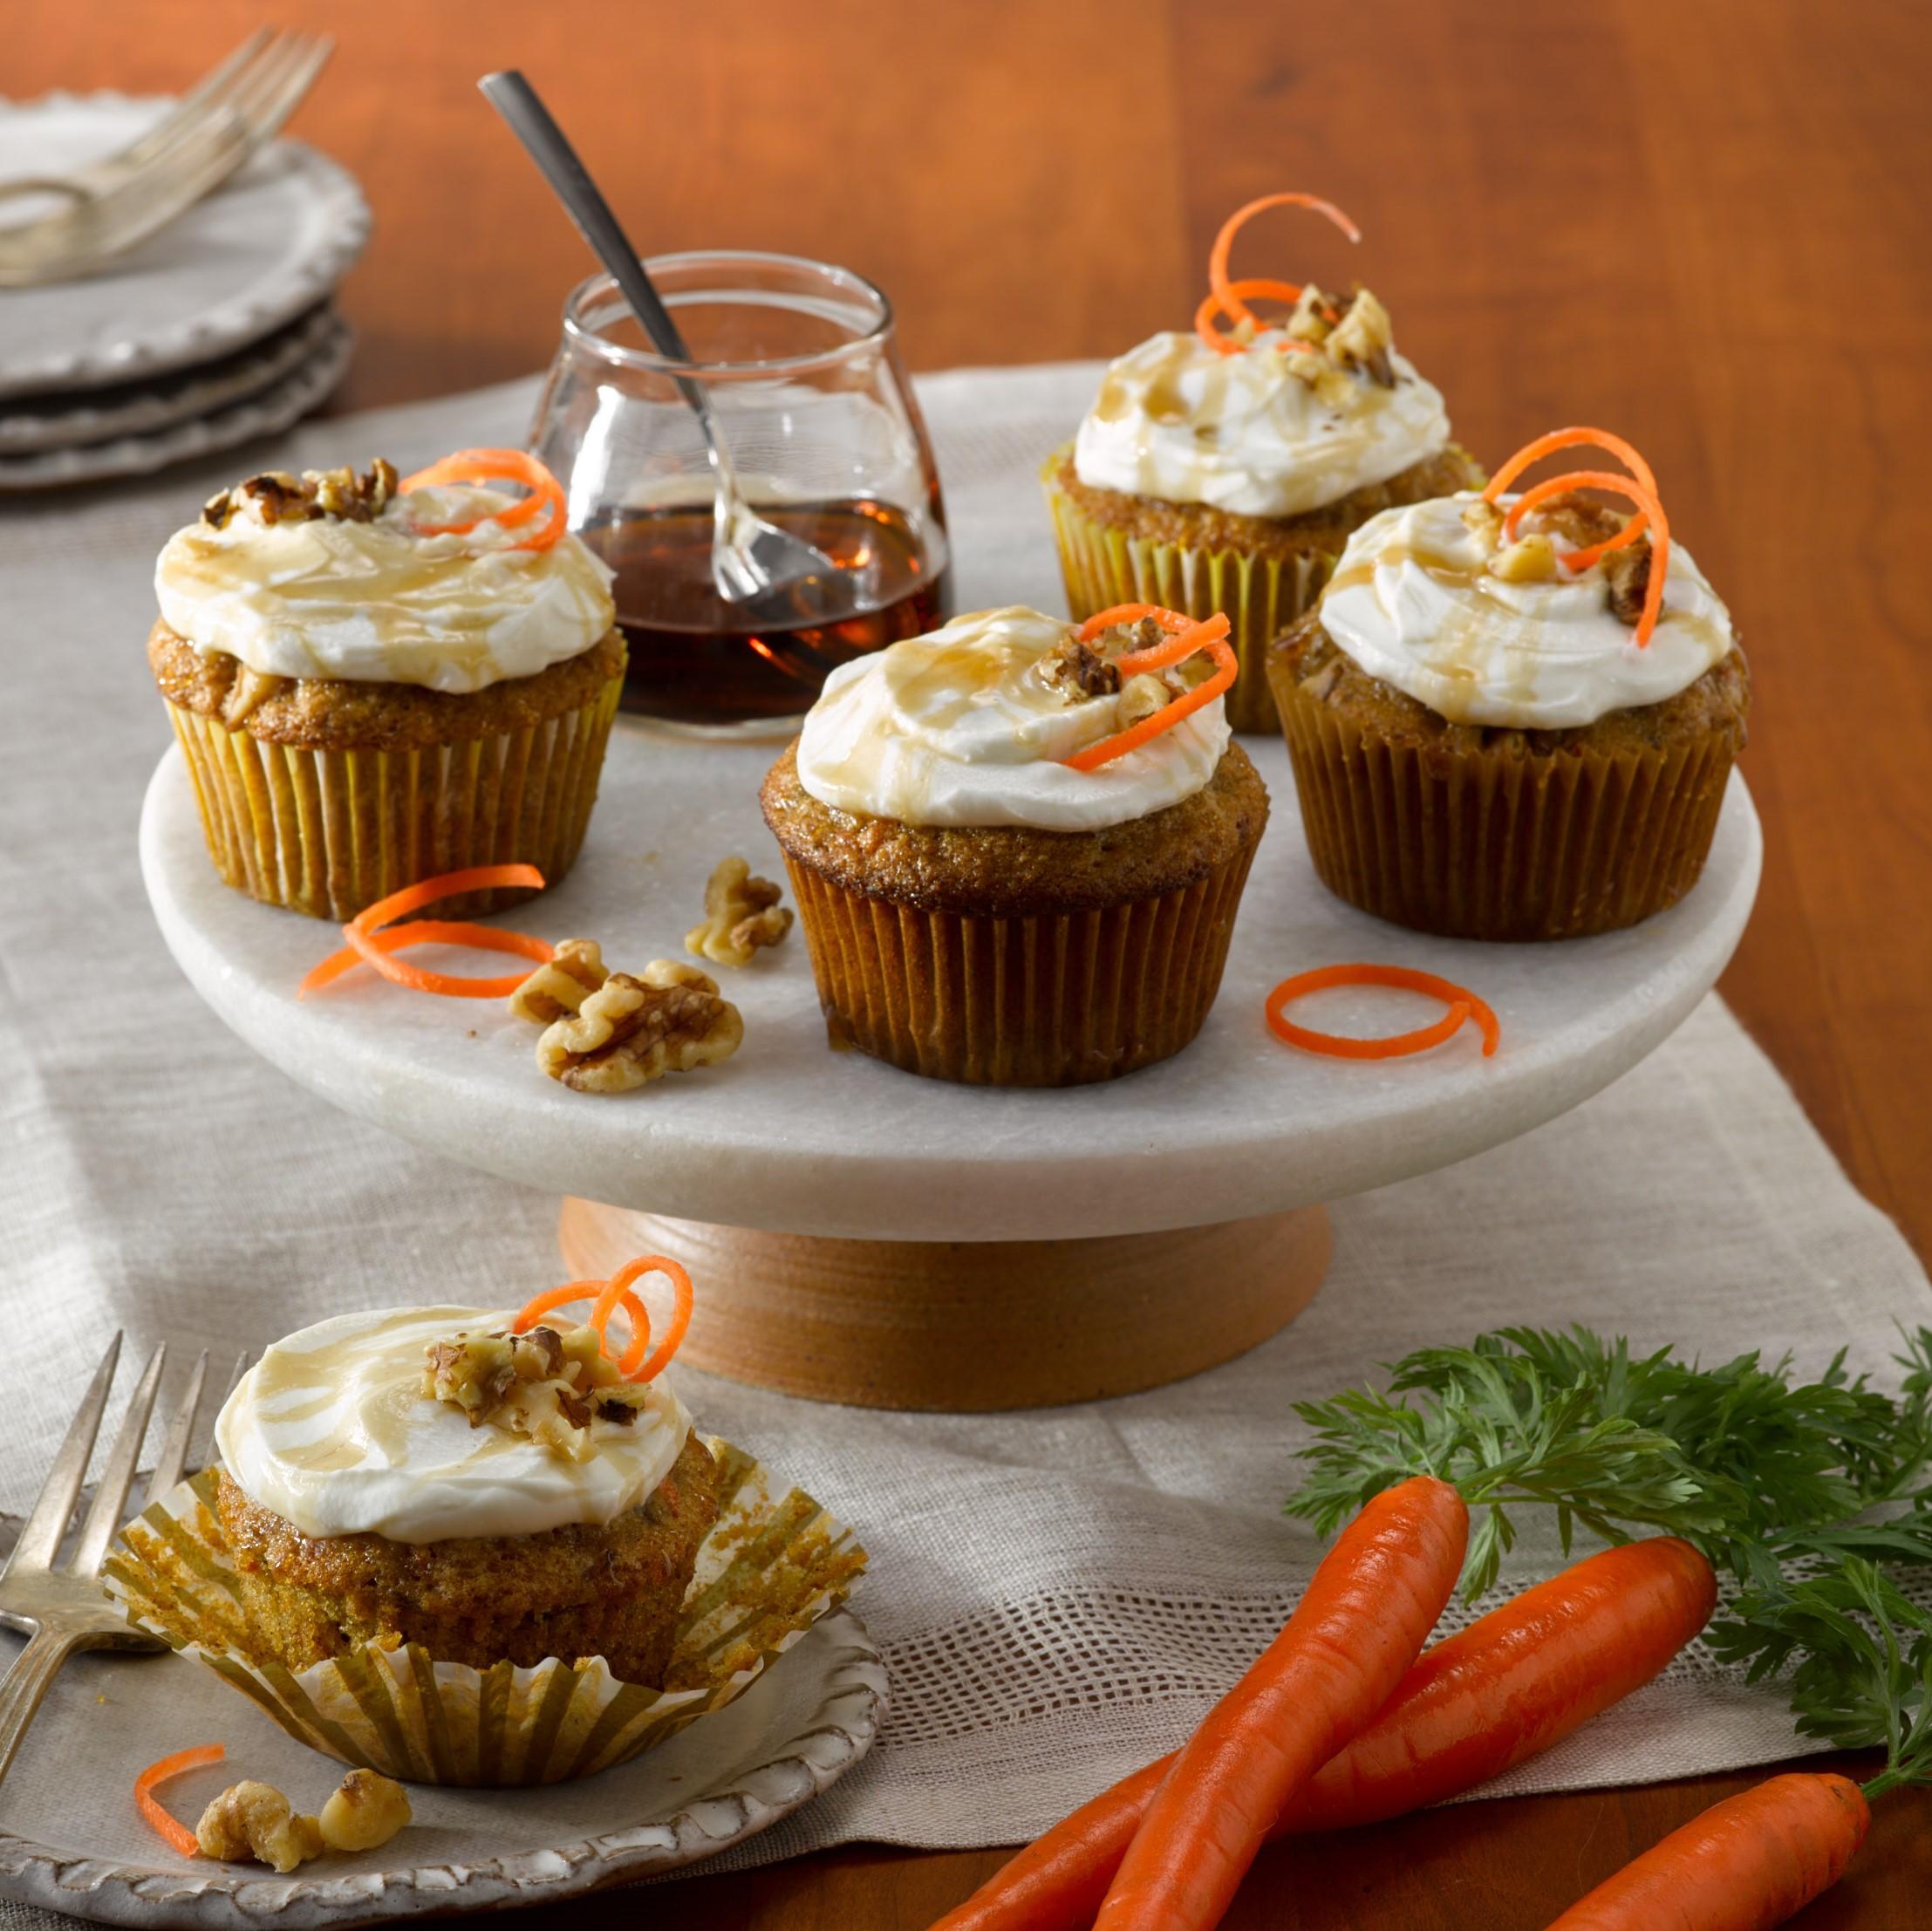 Greek Yogurt and Agave Carrot Cupcakes